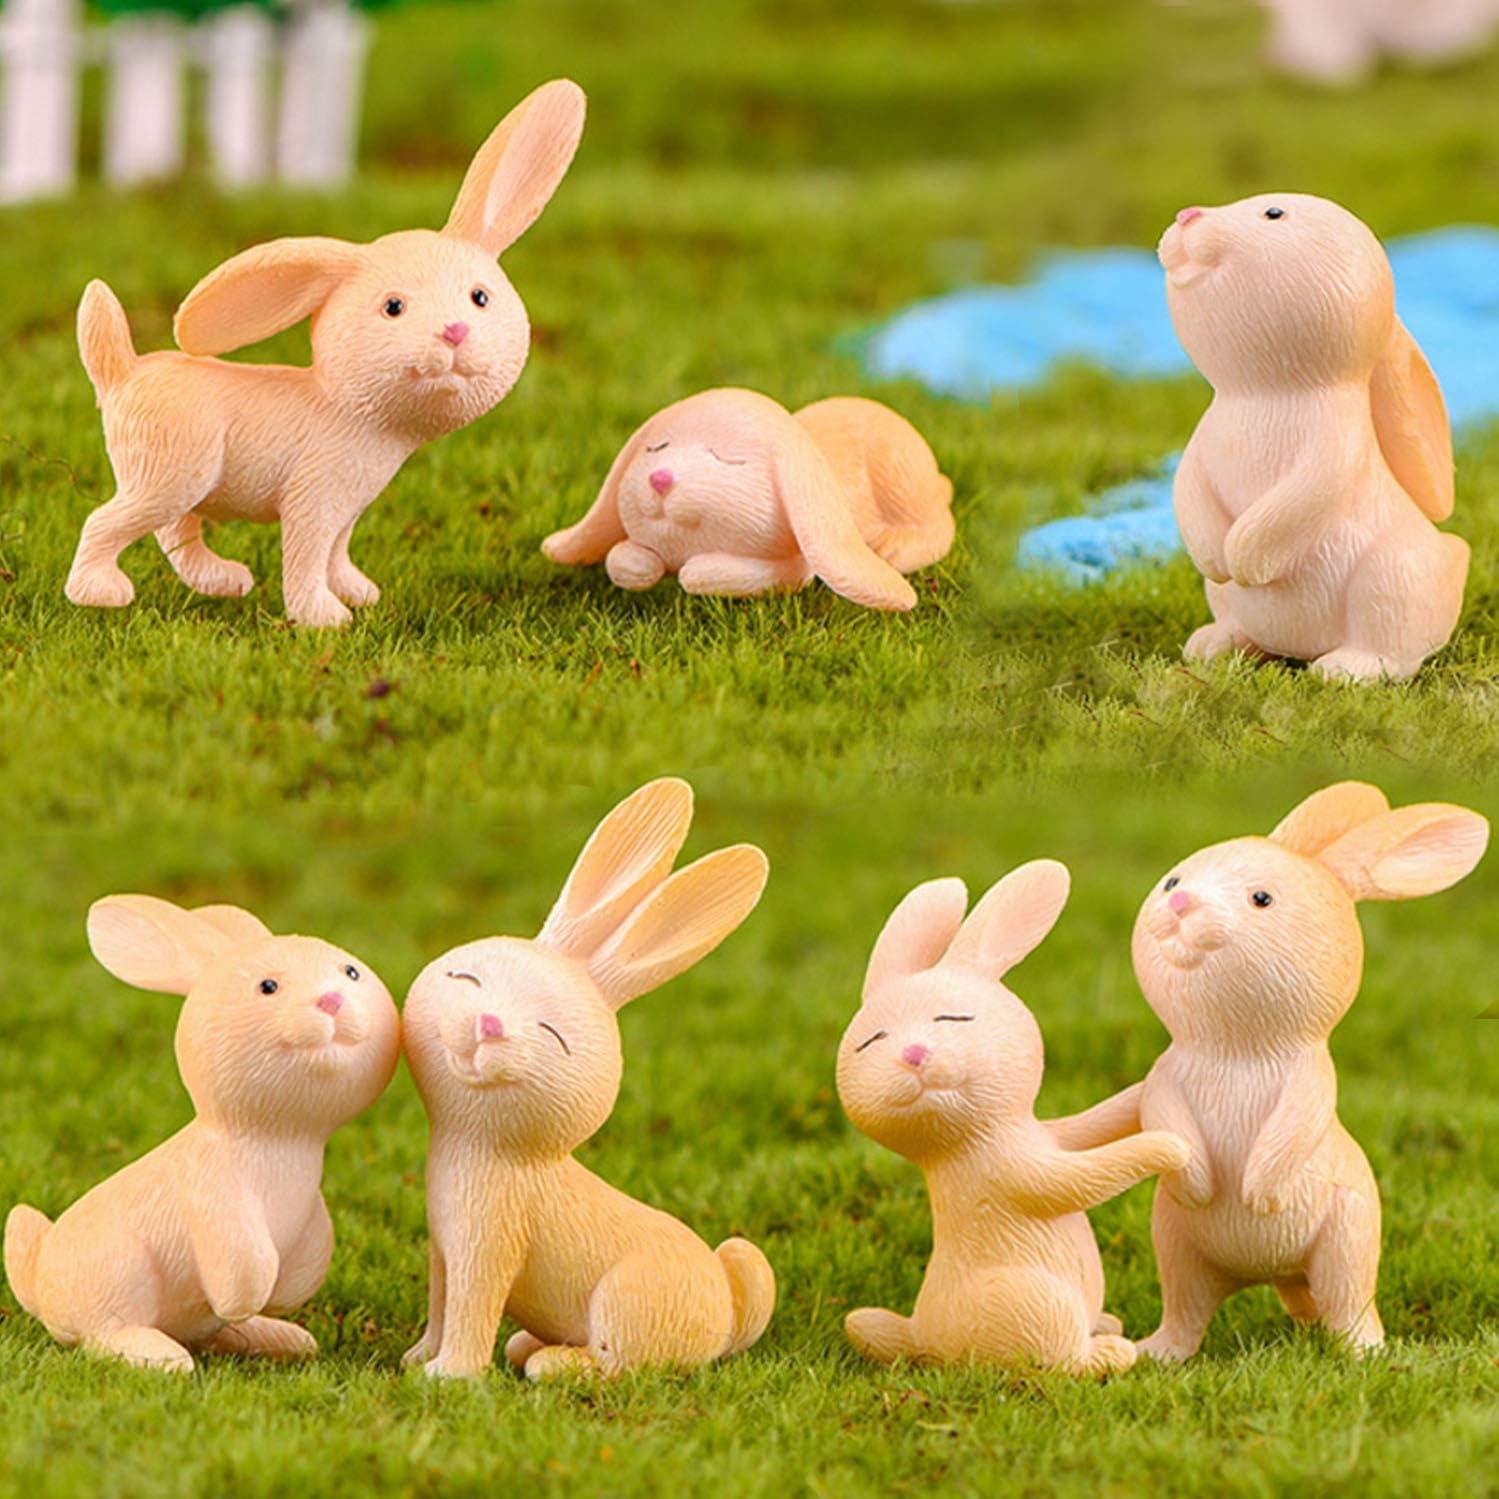 Miniature Bunny Figurines Animal Rabbit Figure Figurine Fairy Garden Decorations Yellow 7 PCS